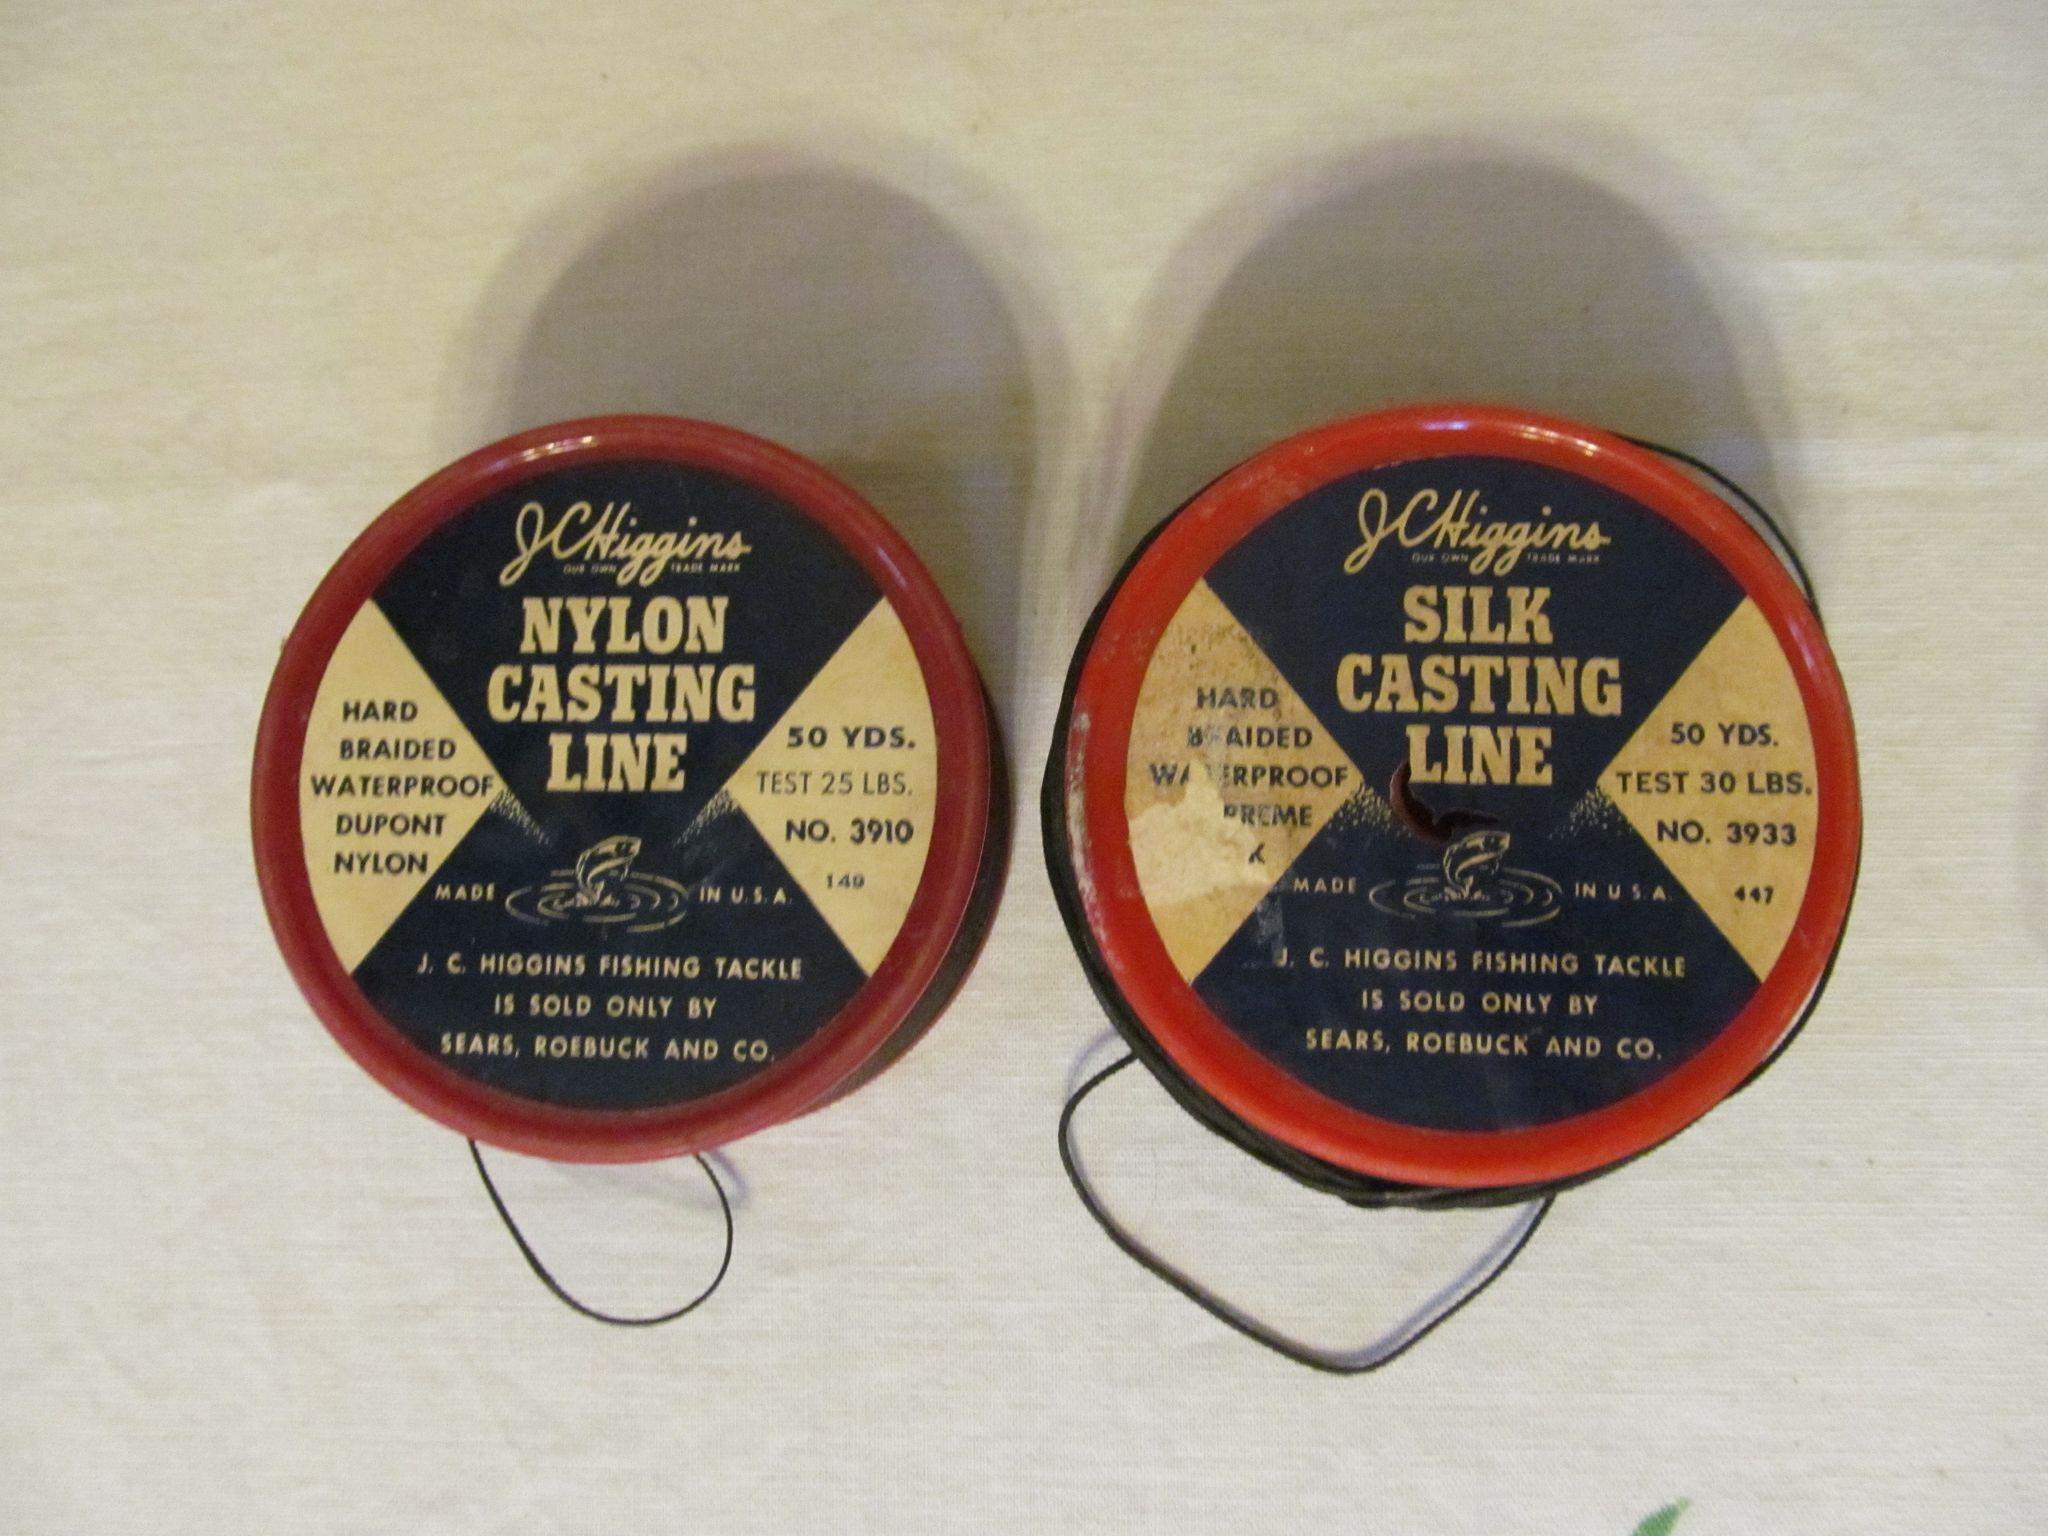 J C Higgins Nylon Casting Line & Silk Casting Line